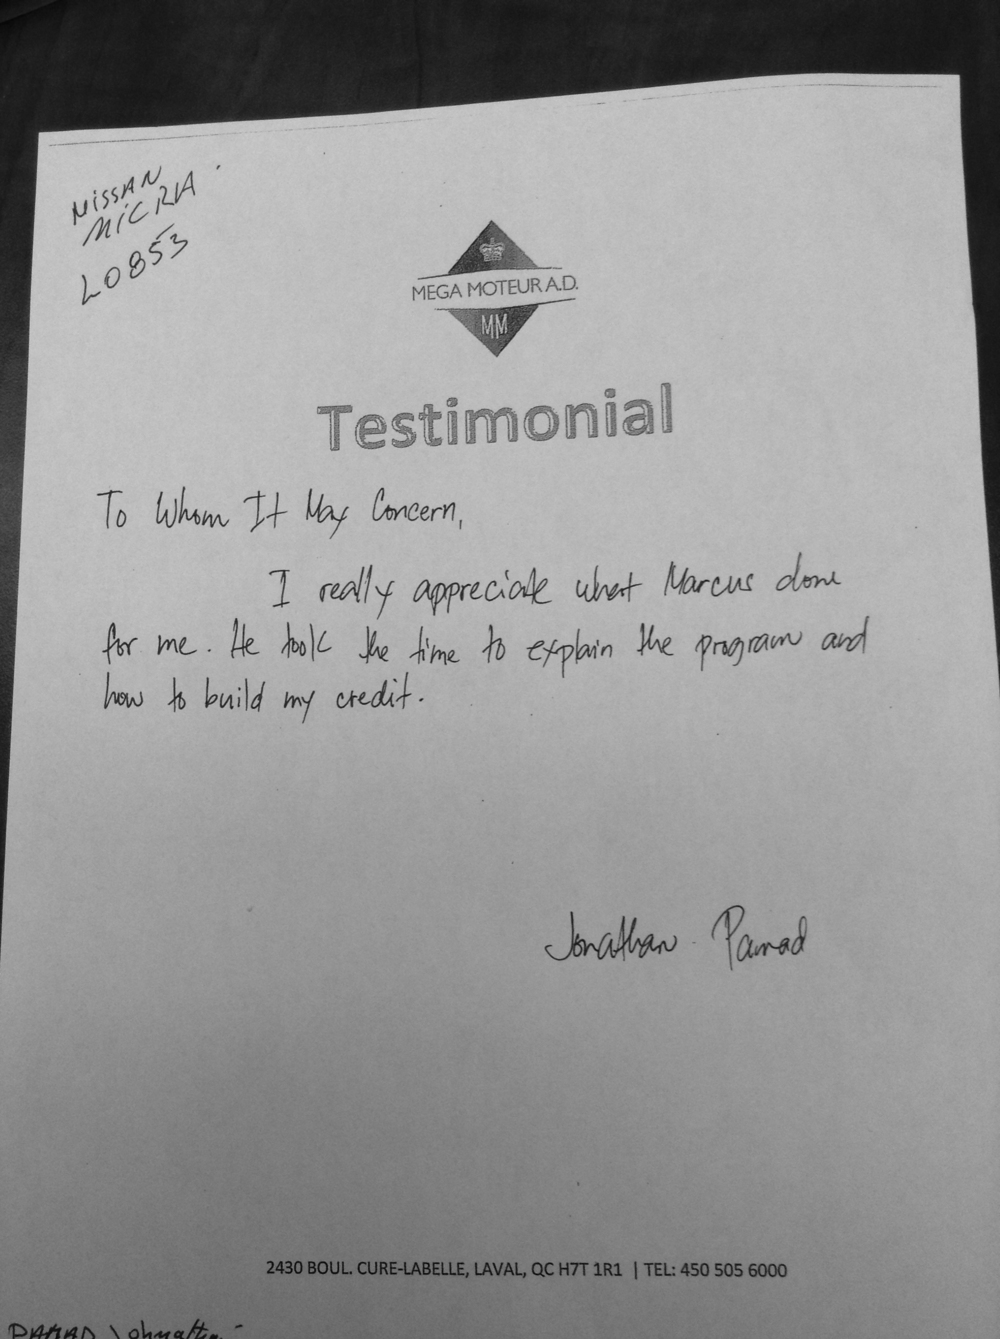 Johnathan pamad_Testimonial.jpg